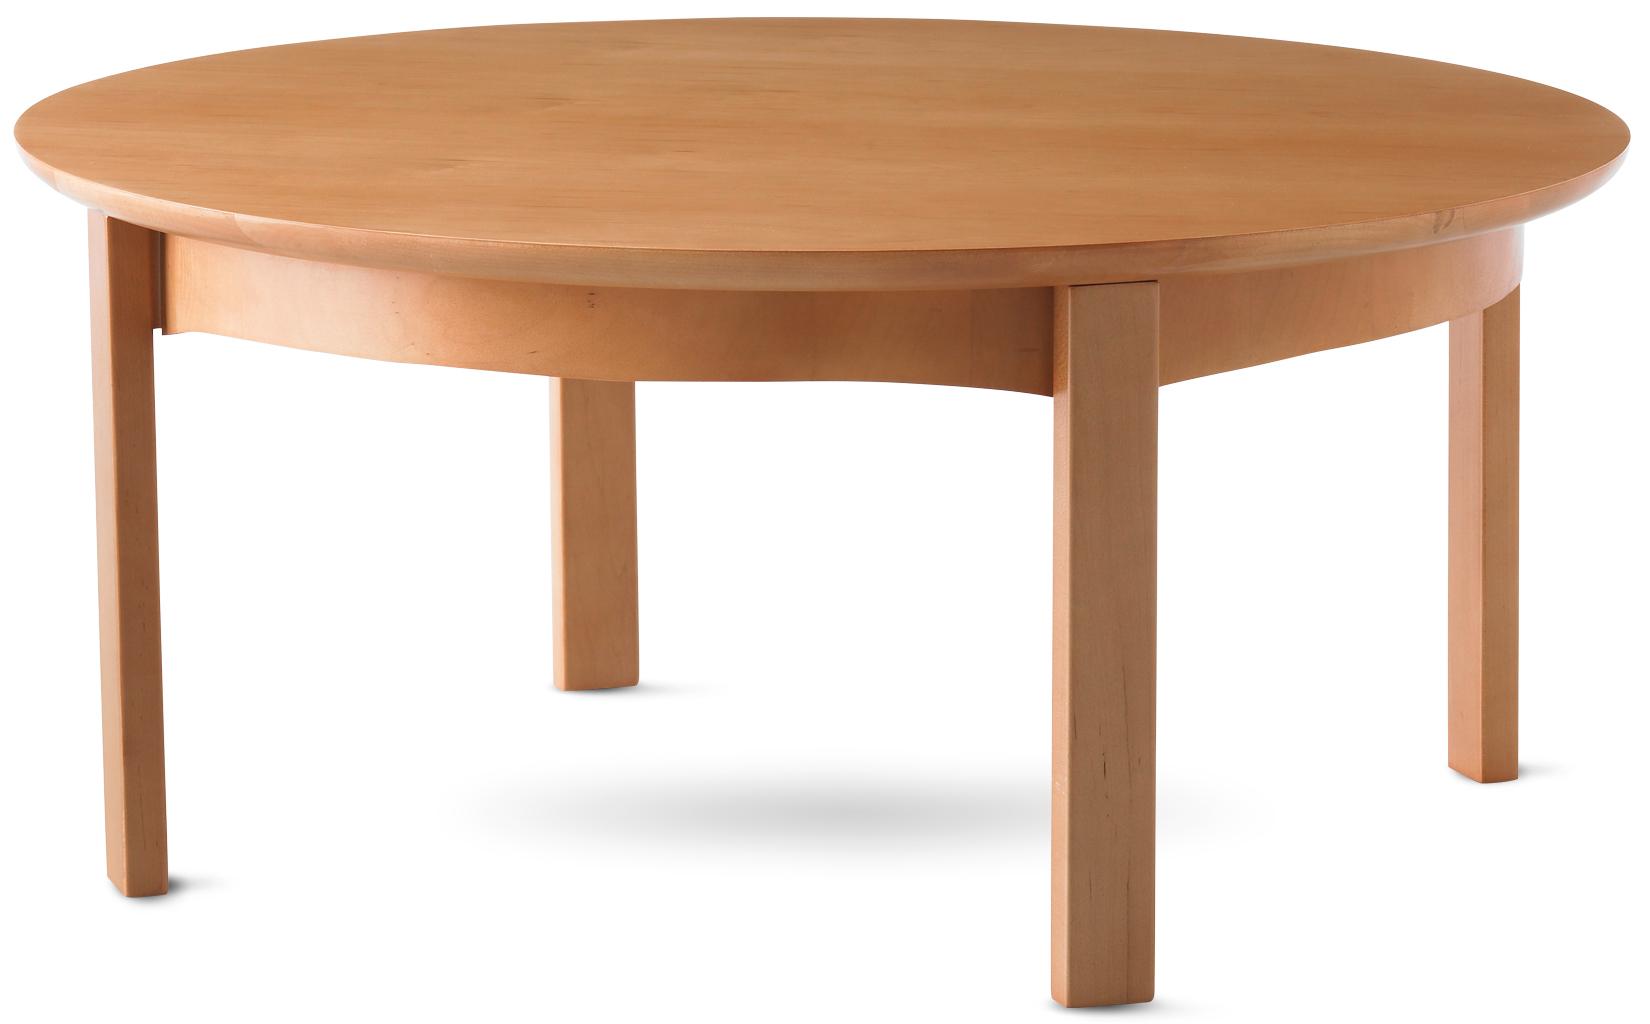 Imagine Table 7480 20 1024x1650px 150dpi